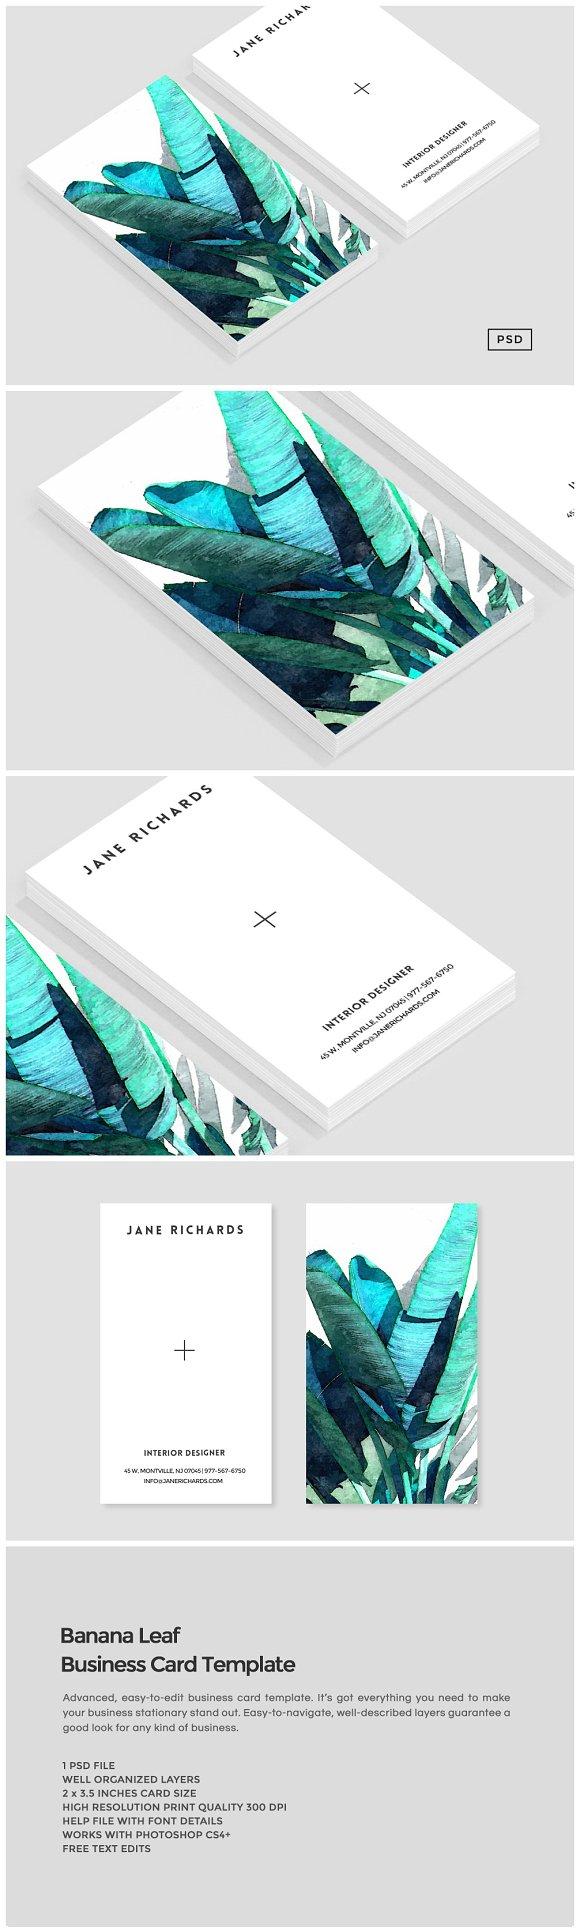 Banana leaf business card template business card for Creative interior design name card